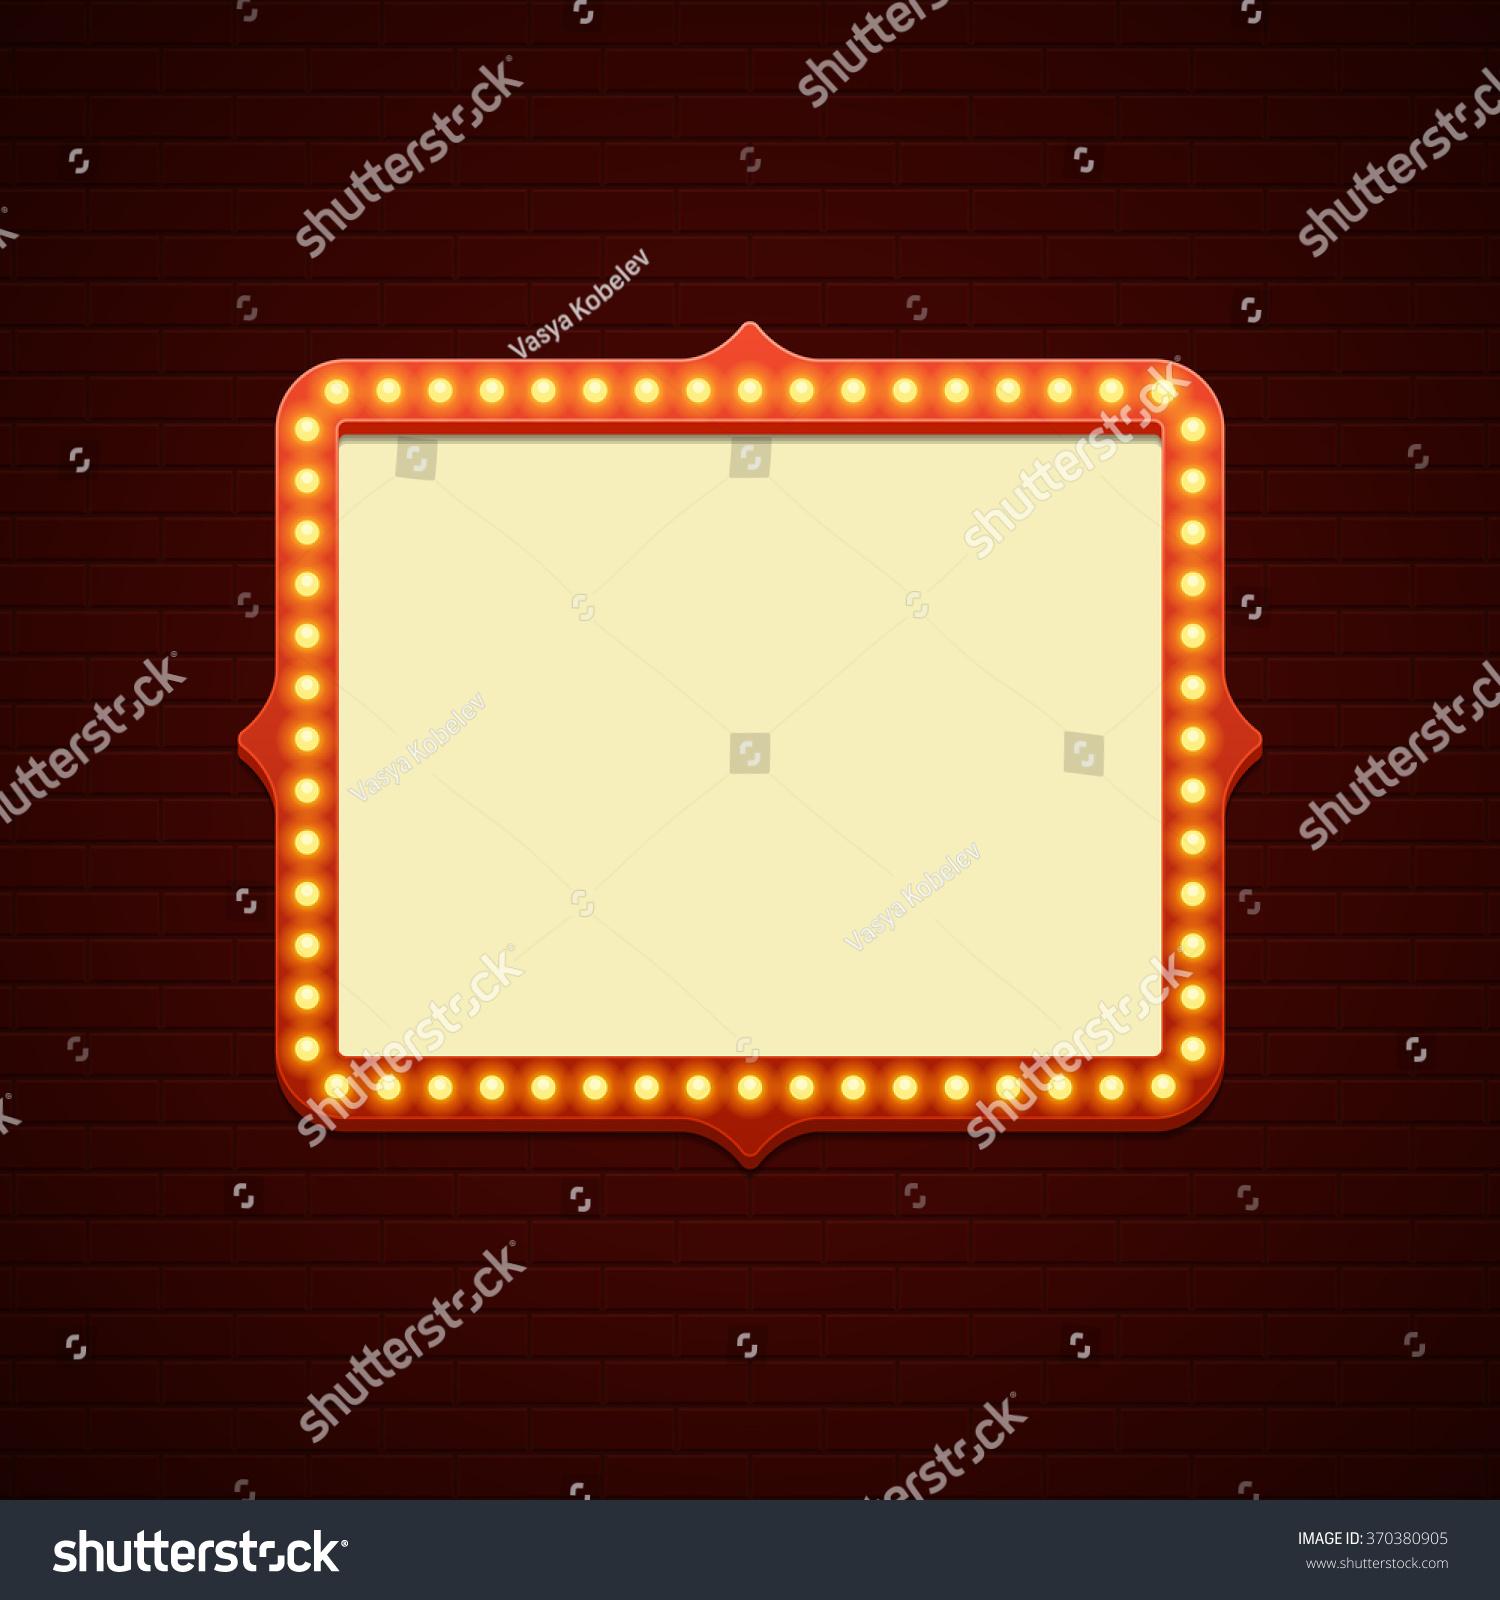 Retro showtime sign design cinema signage stock vector 370380905 shutterstock - Showtime design ...